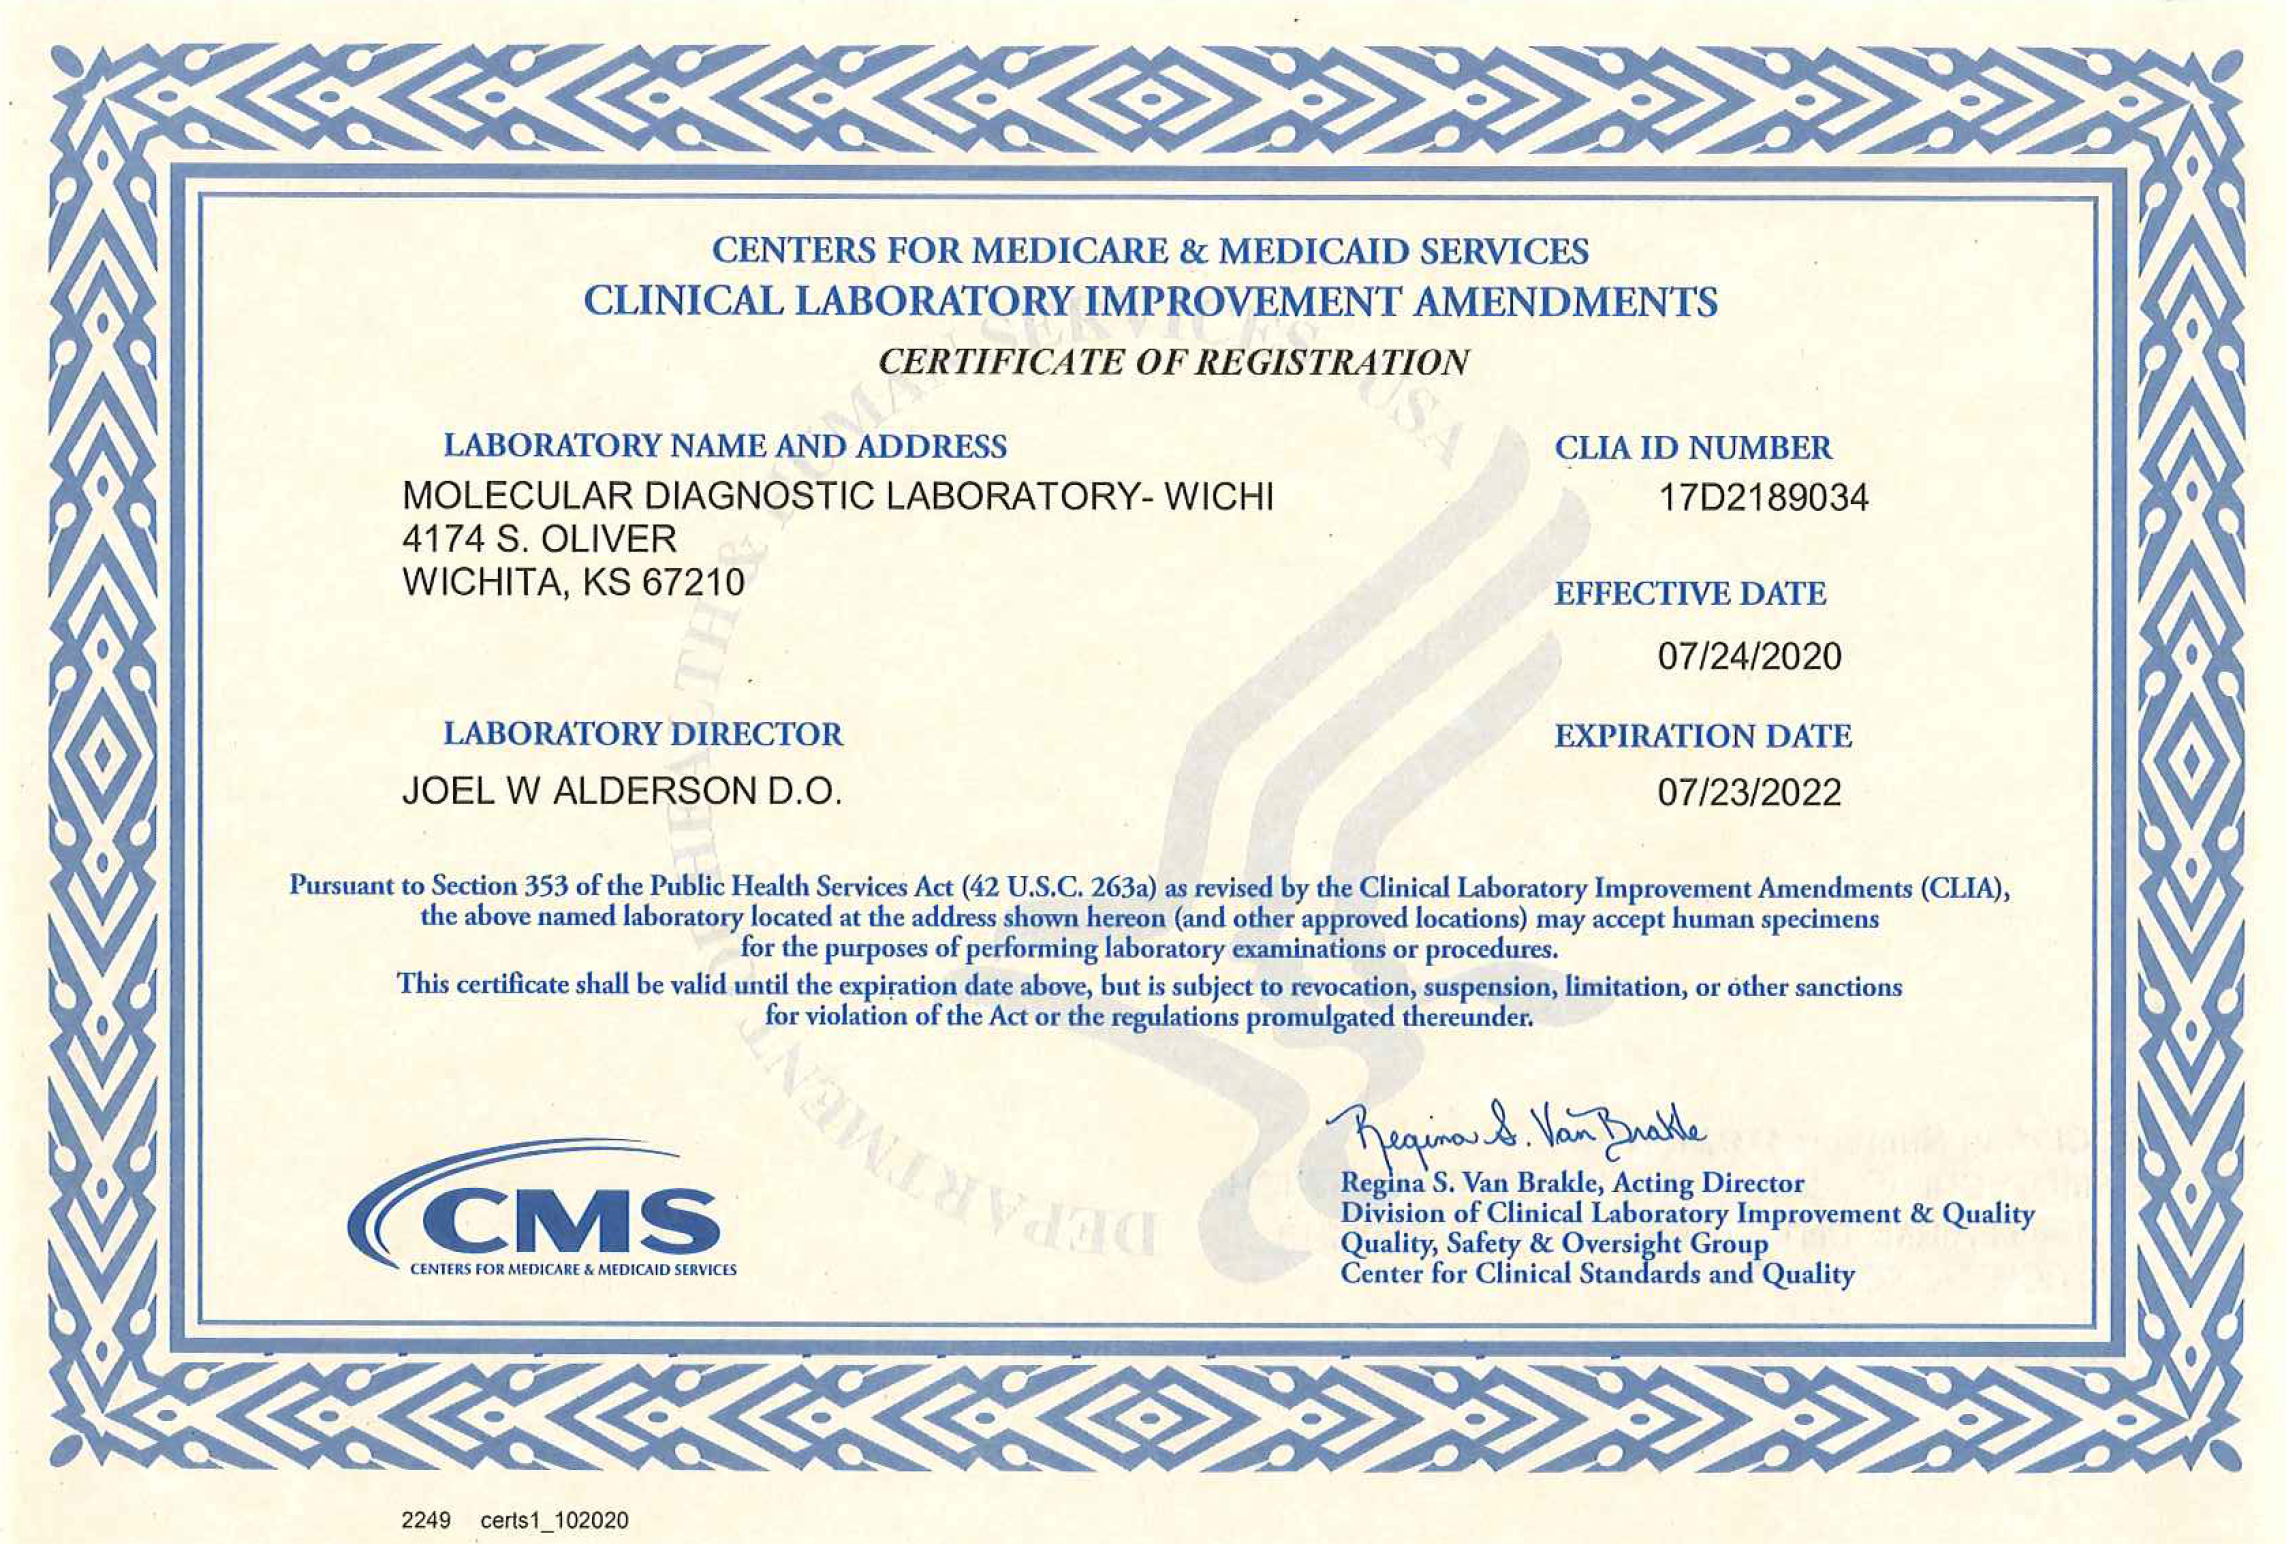 clia certification certificate lab wichita diagnostics certifications molecular laboratory cms